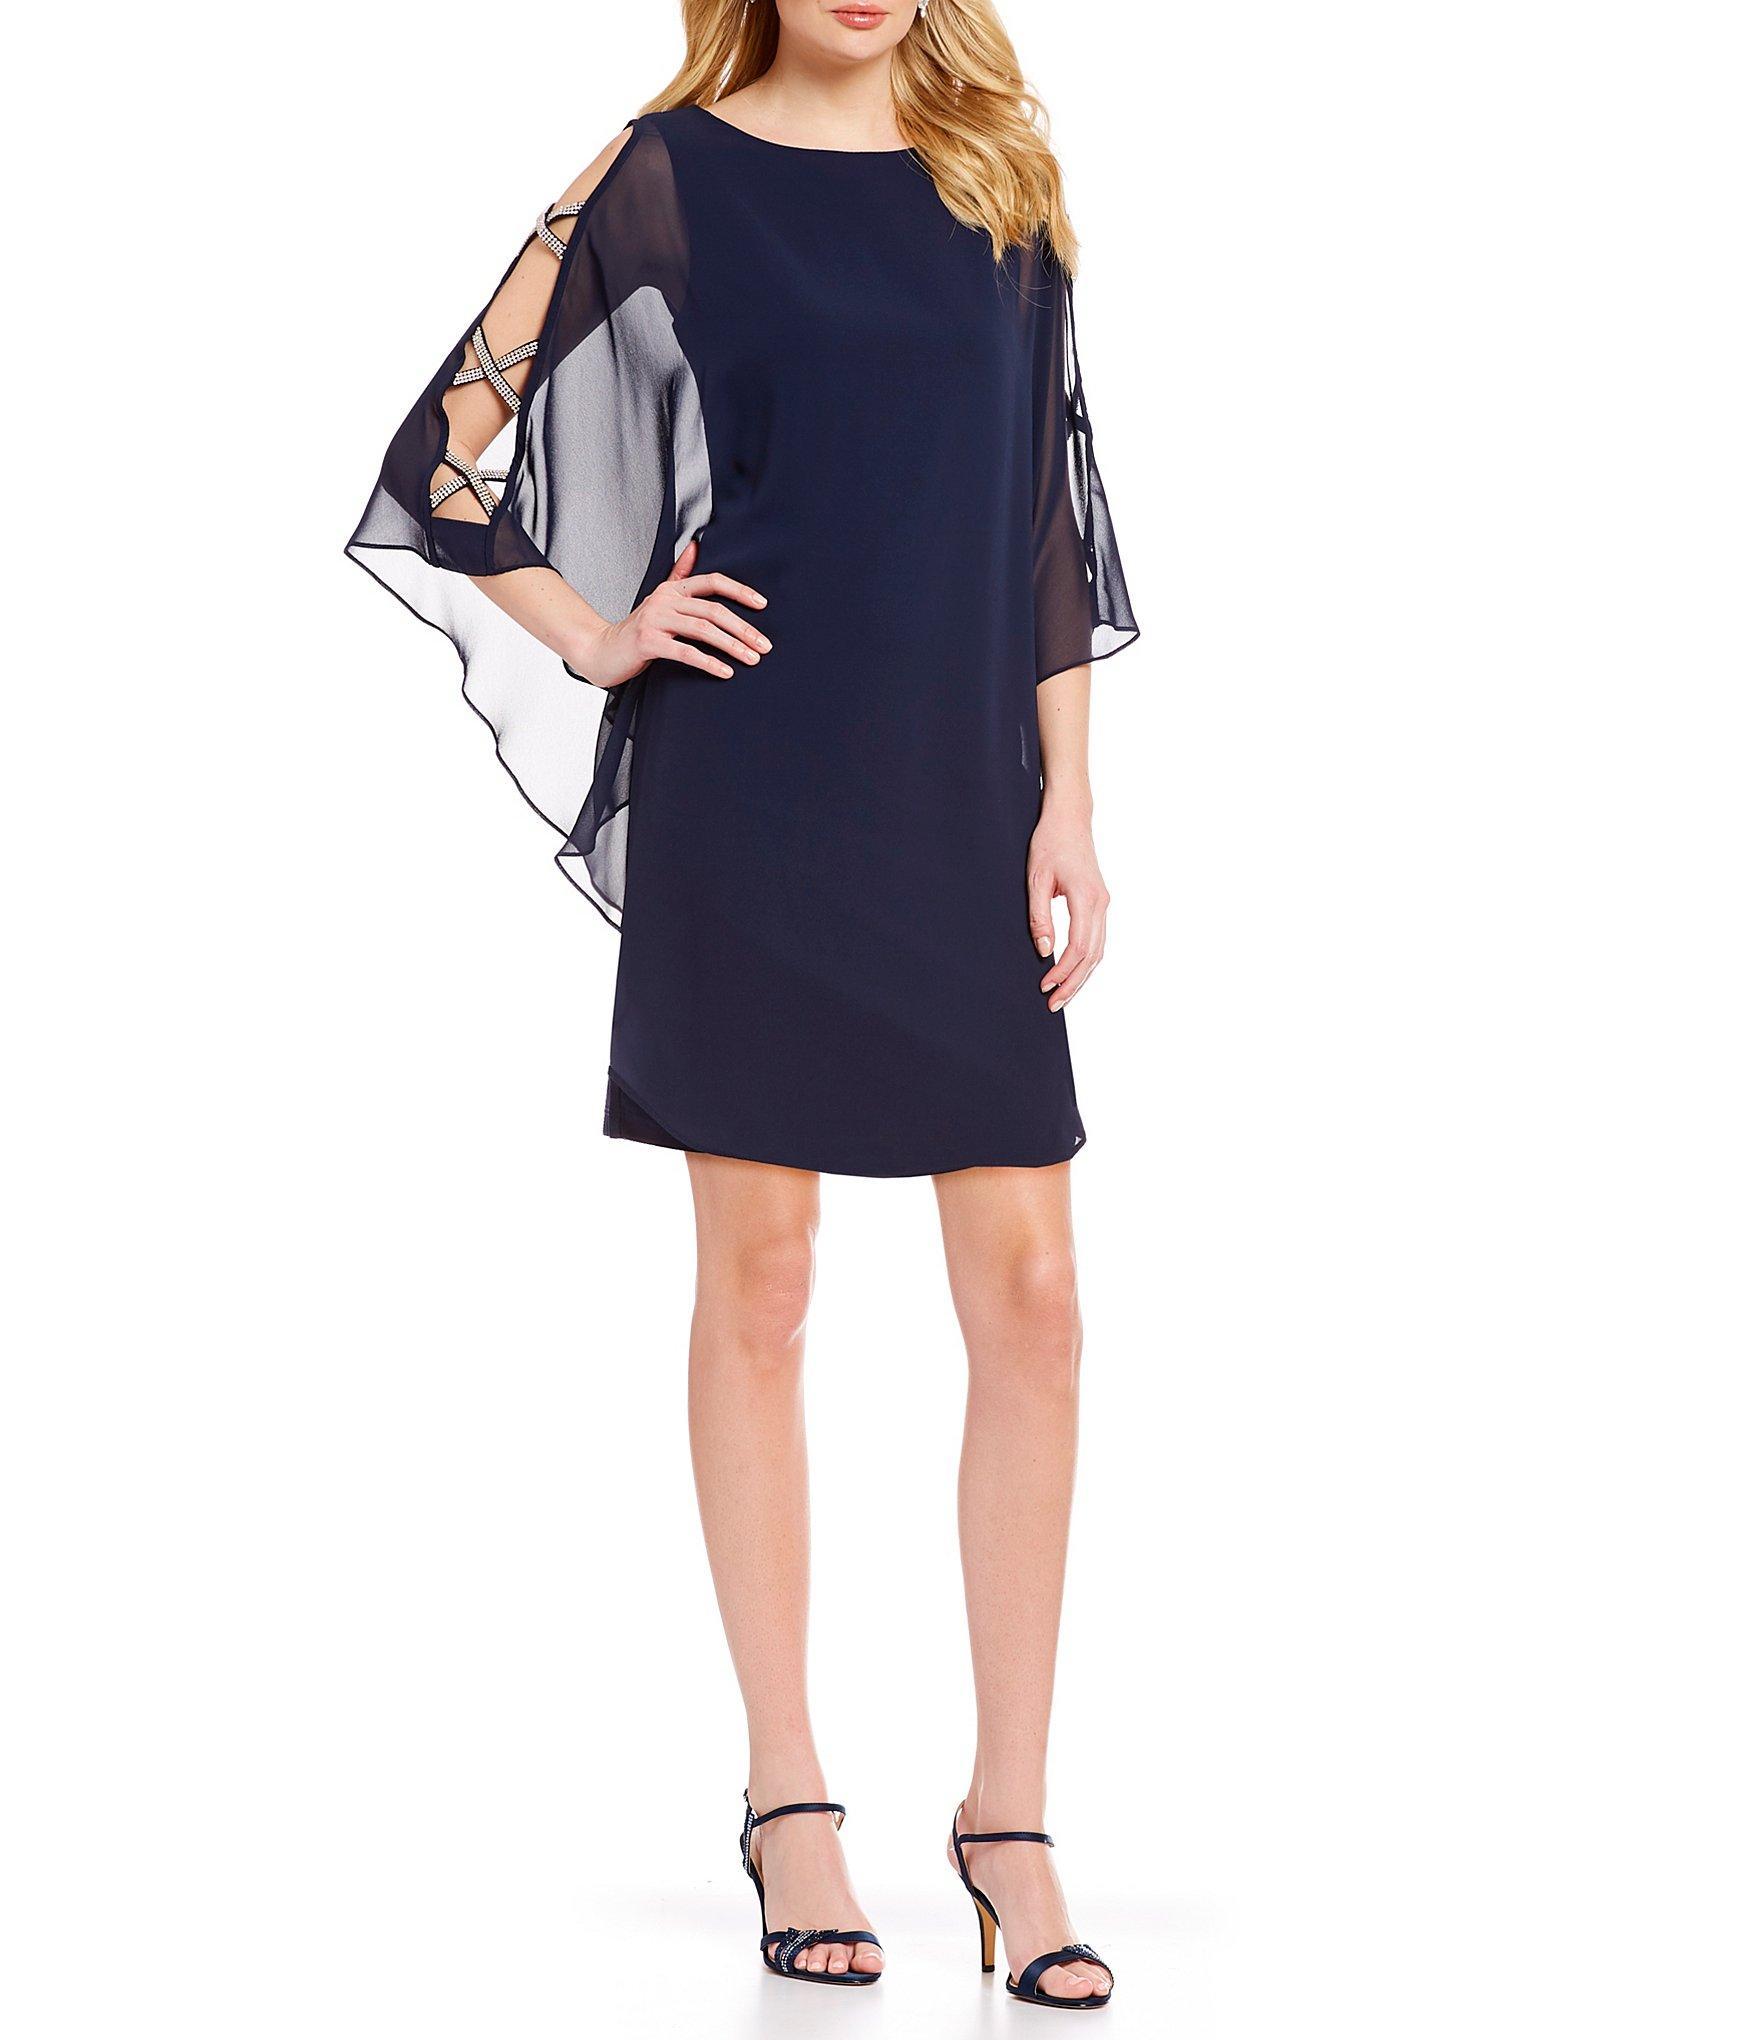 c97c0b9ee0f Lyst - Xscape Chiffon Cape Sleeve Sheath Dress in Blue